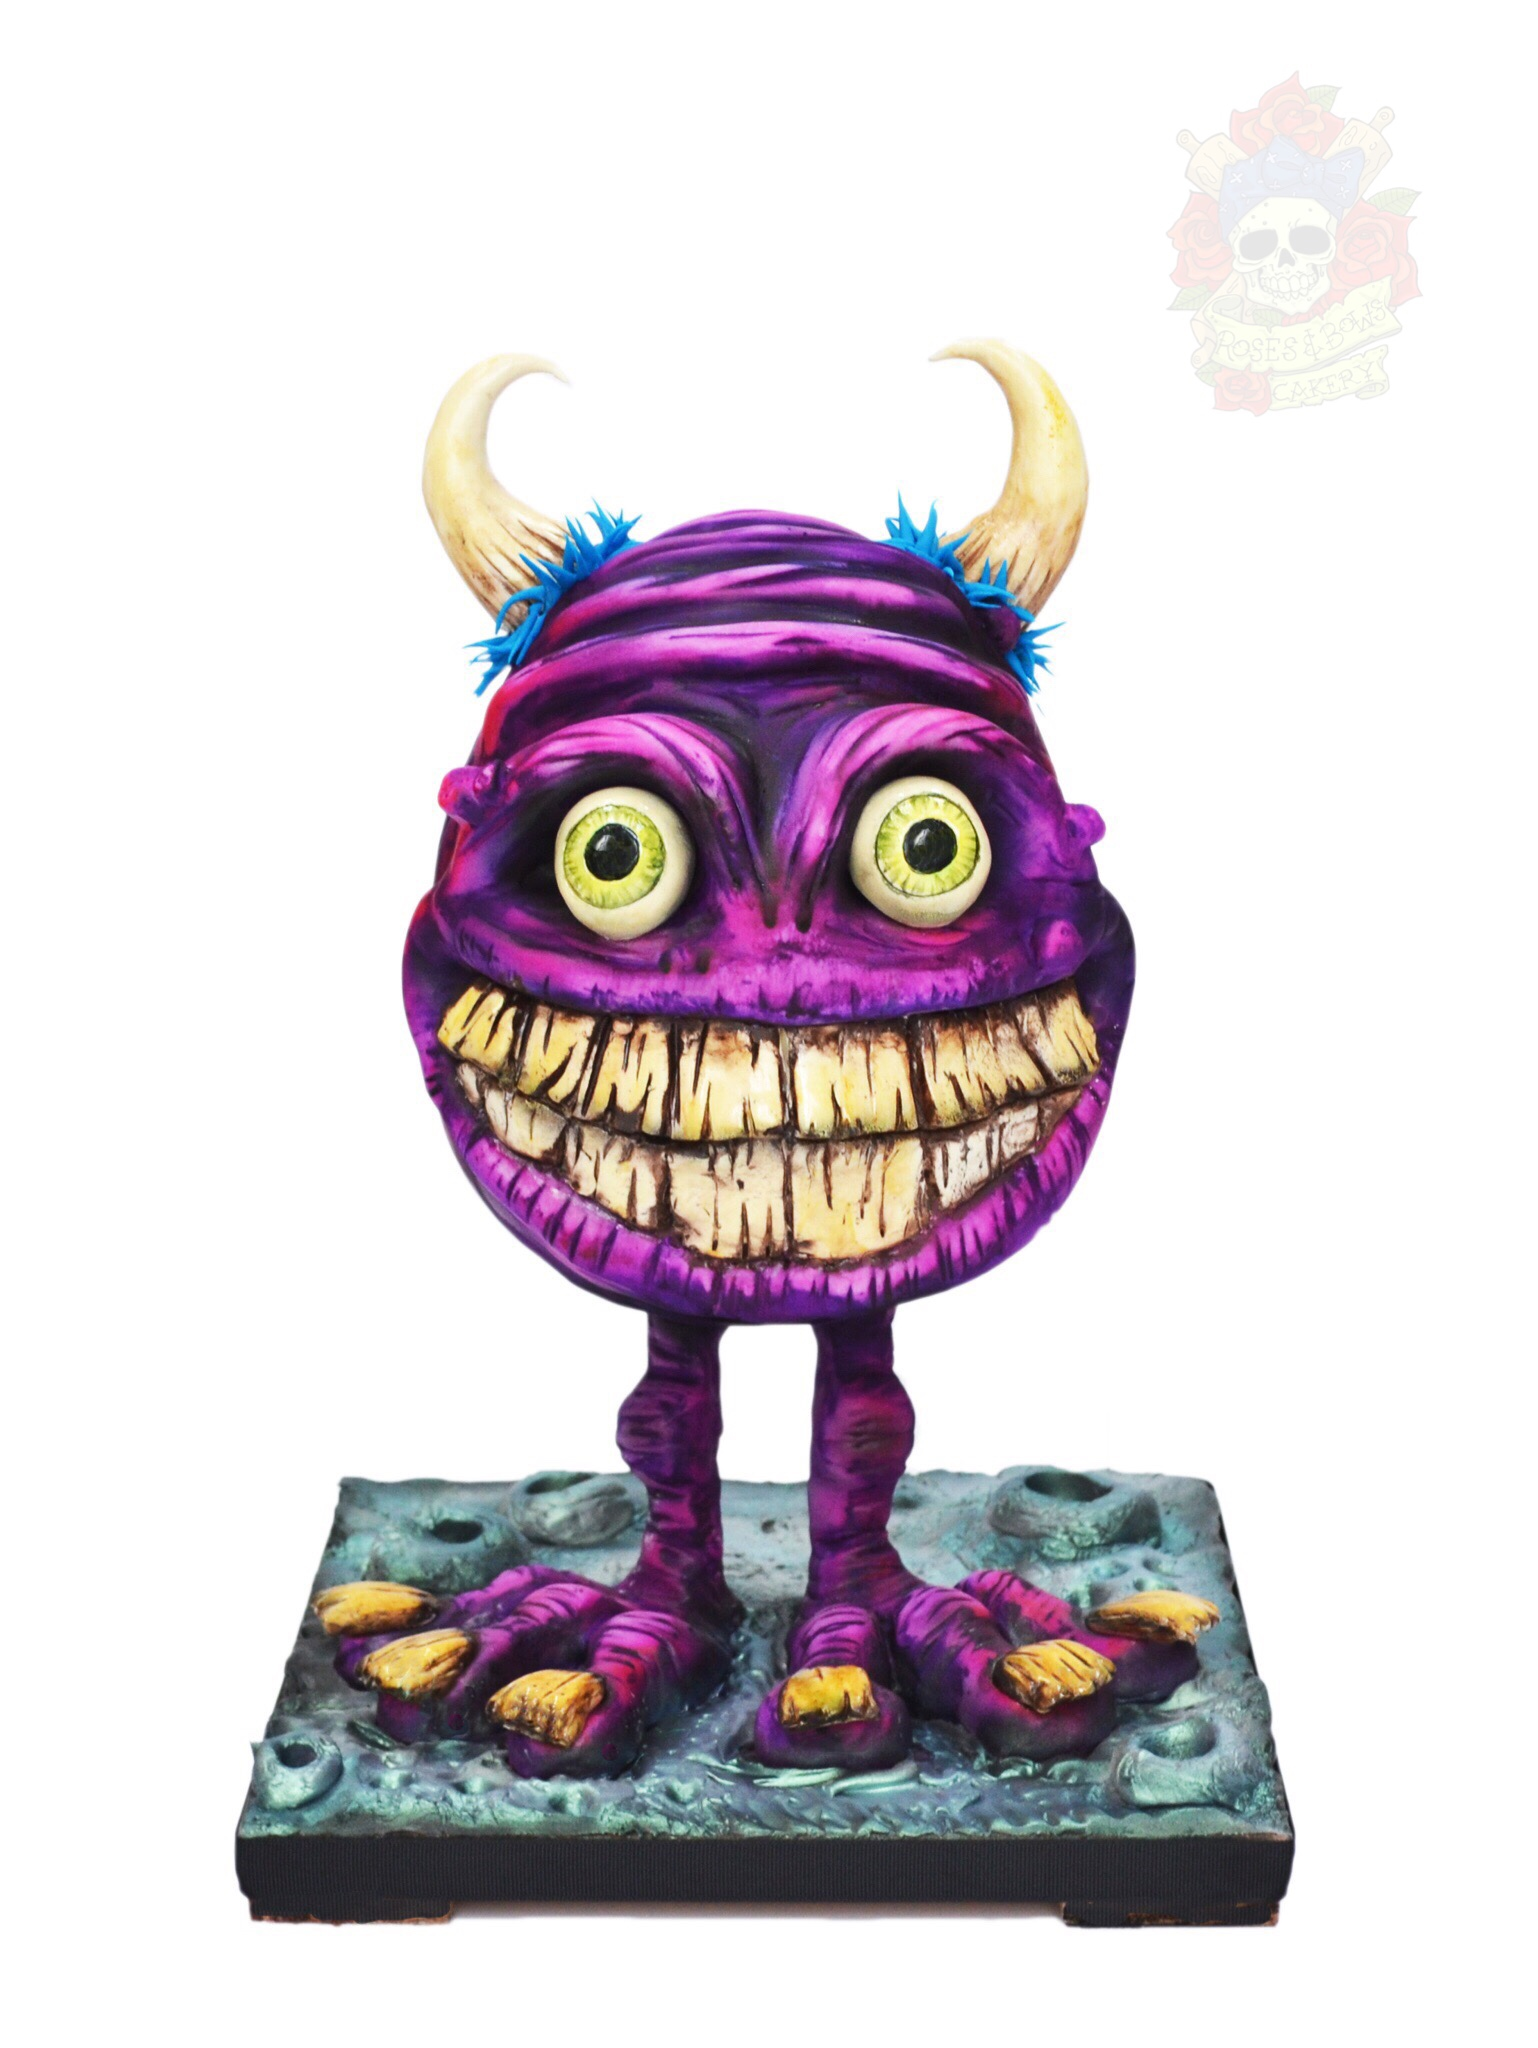 Bright purple monster cake